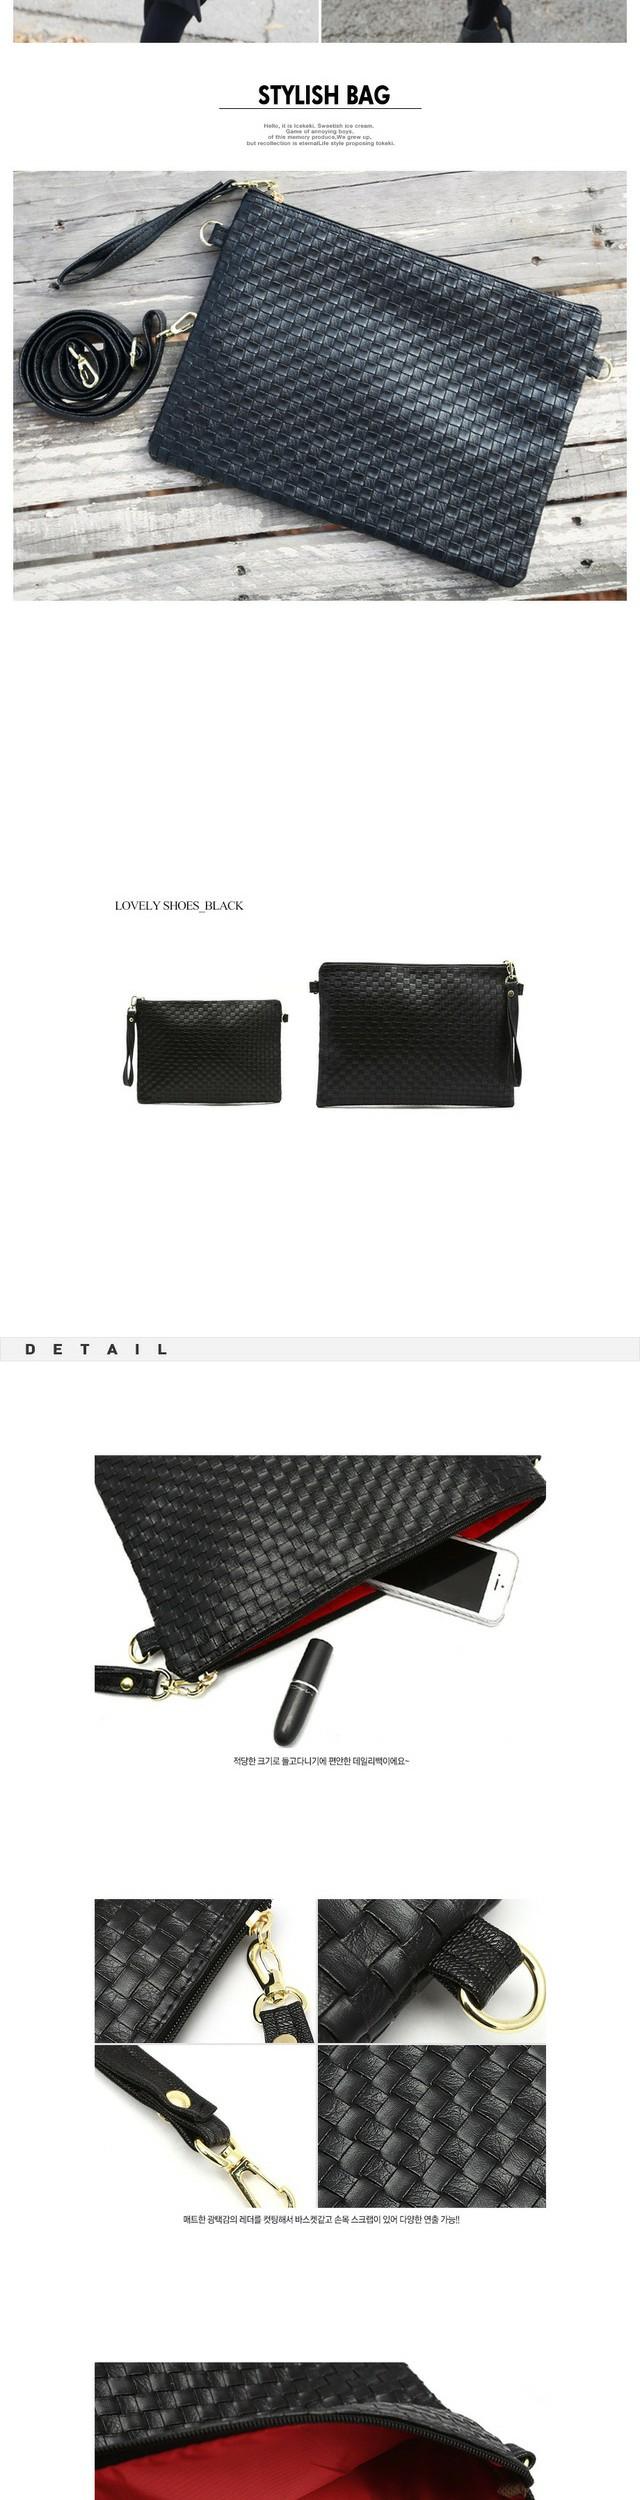 Solid clutch bag